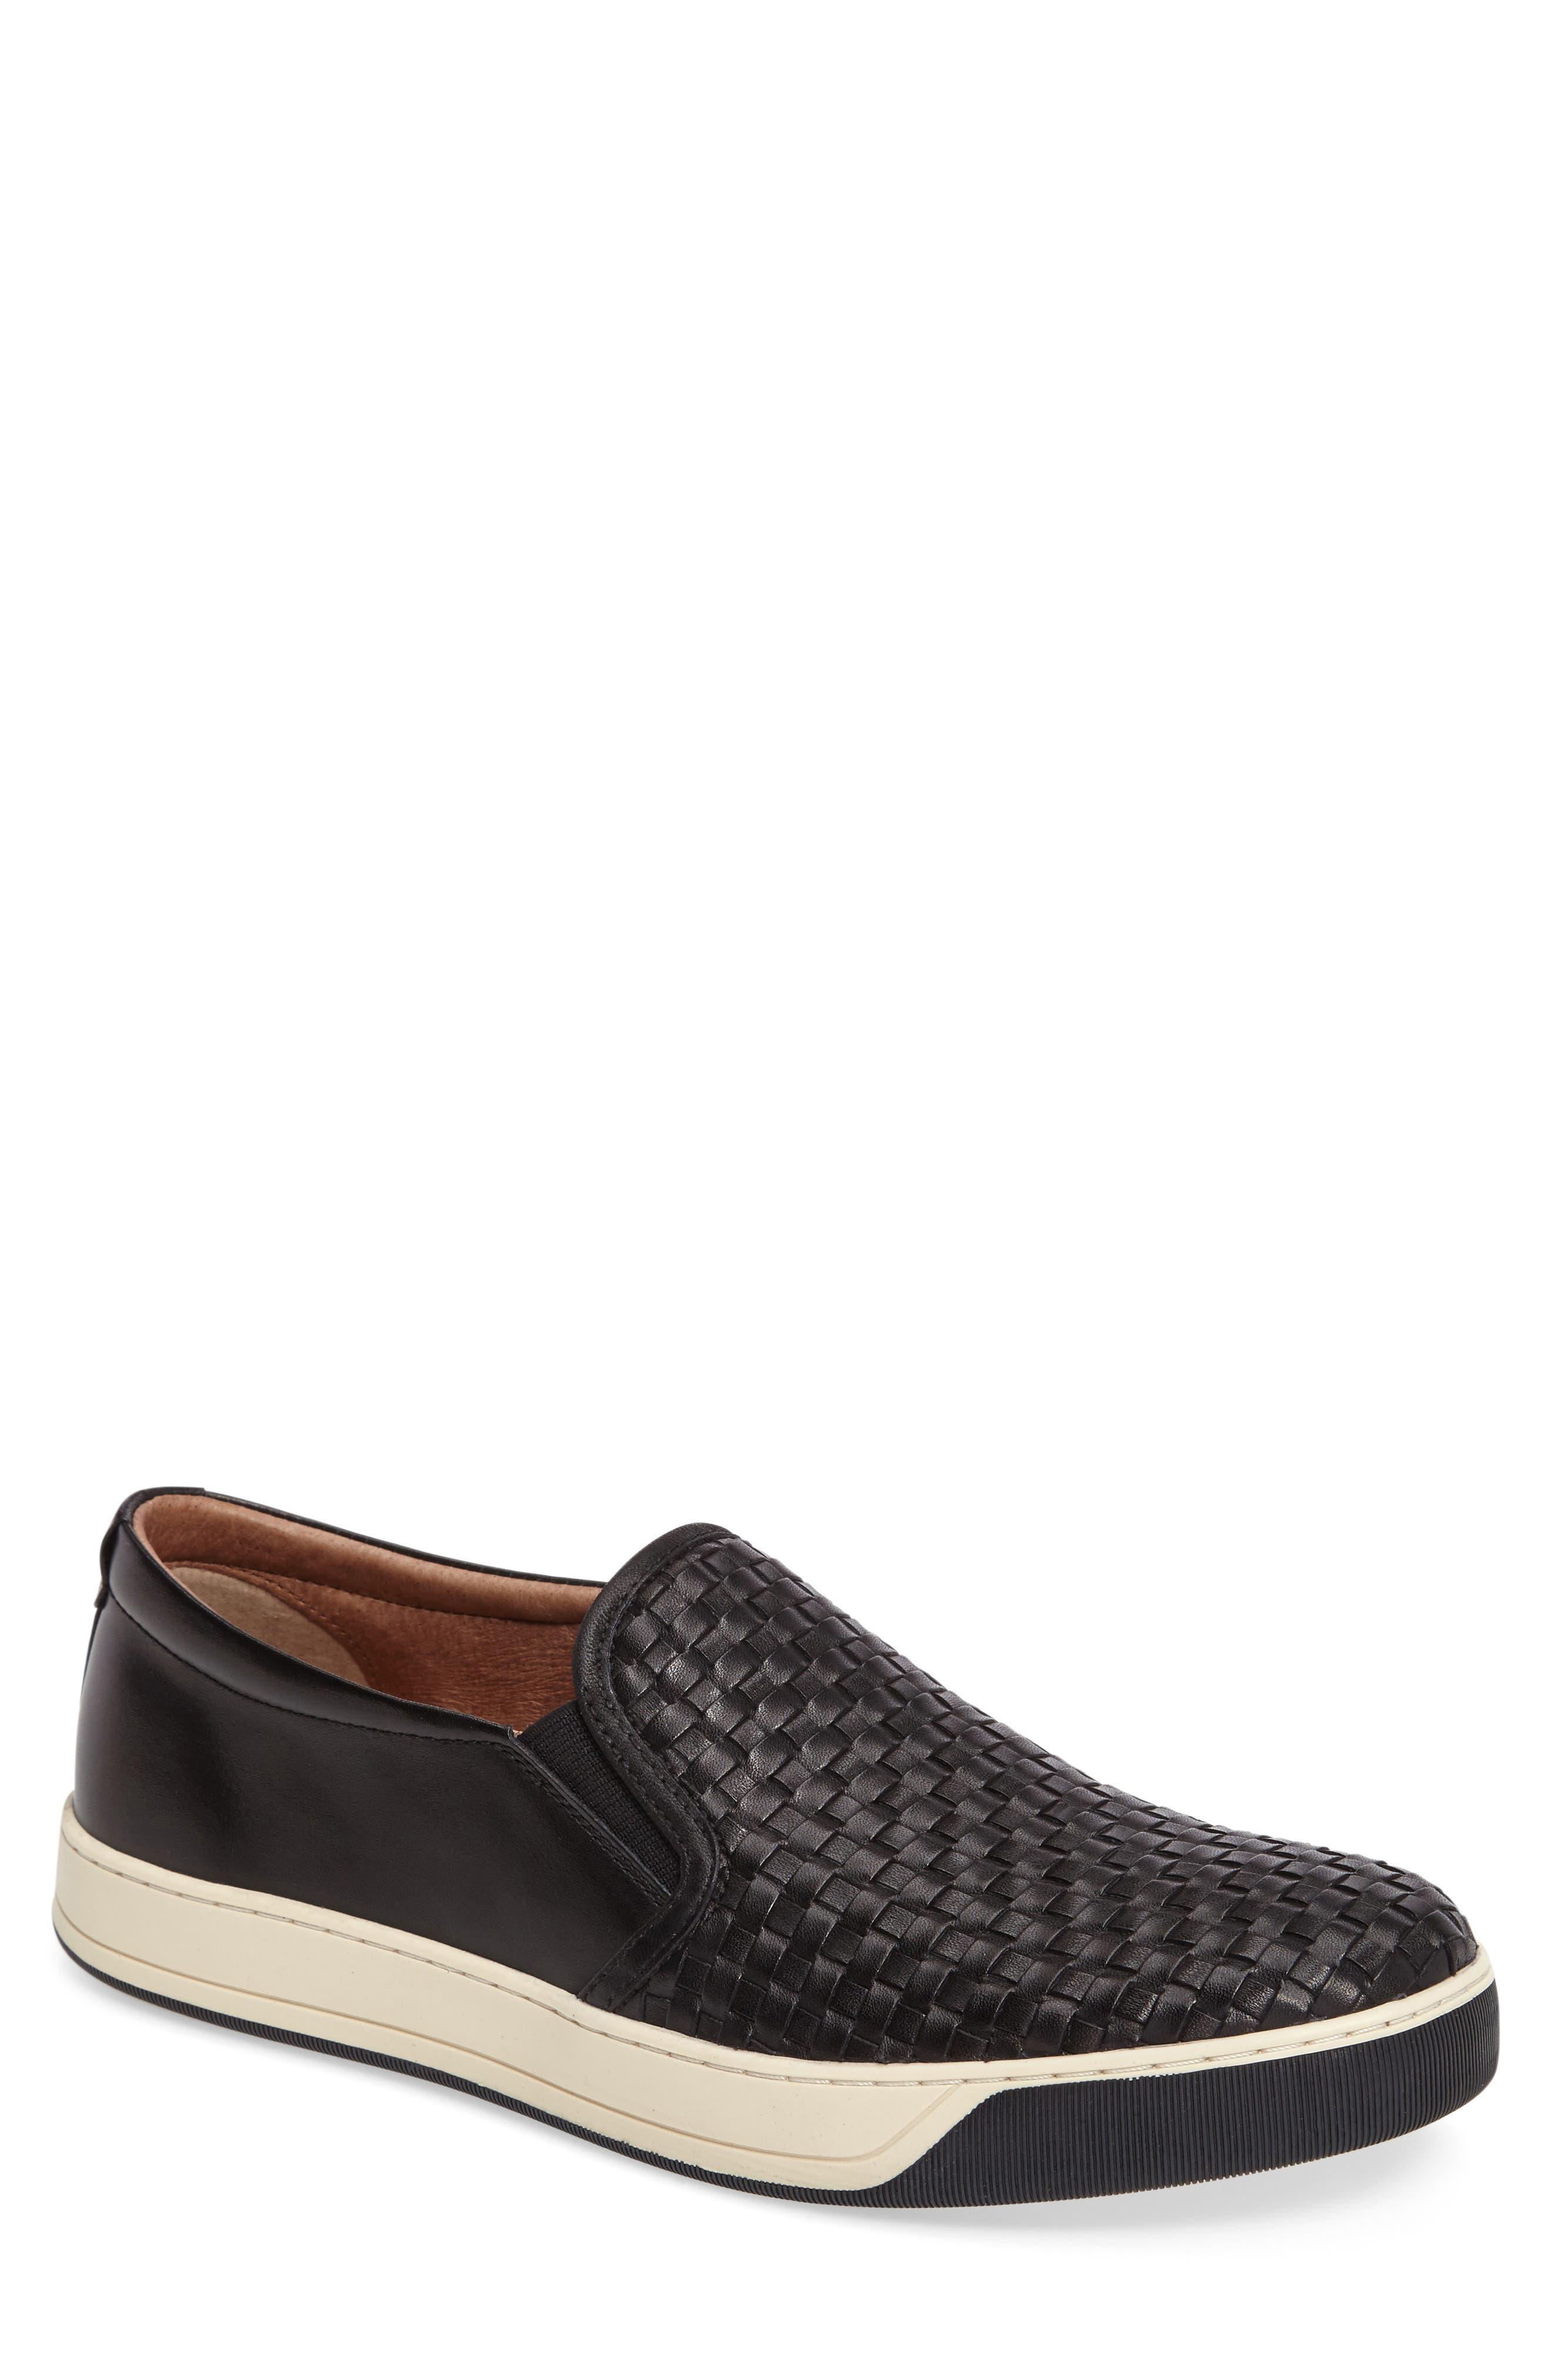 Allister Slip-On Sneaker, Main, color, BLACK LEATHER